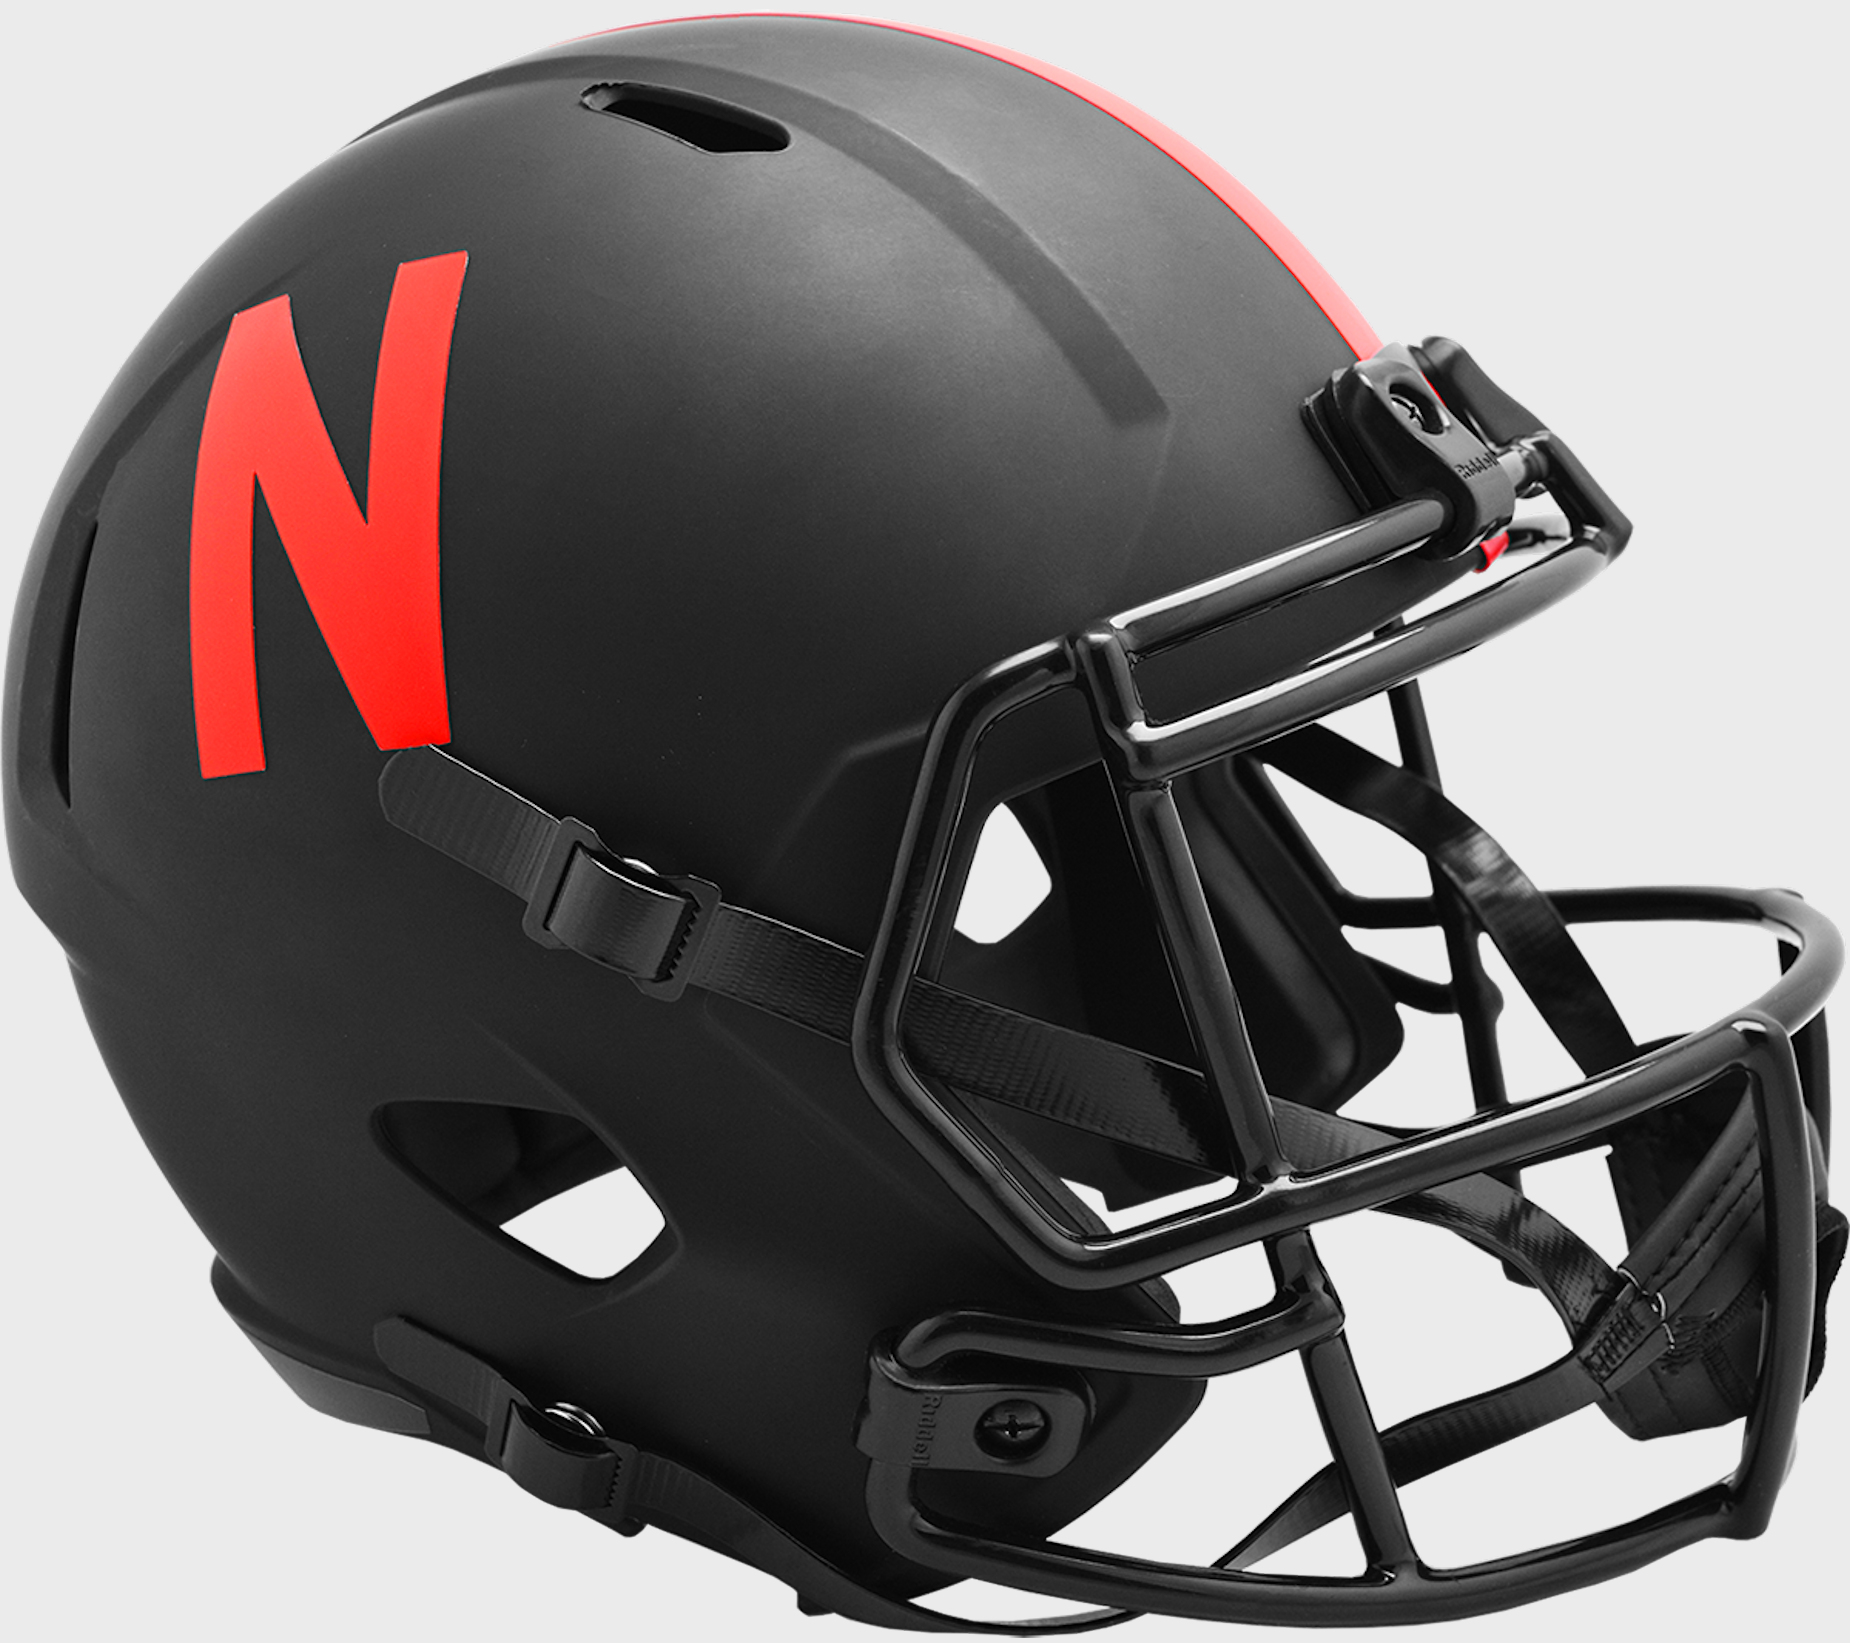 Nebraska Cornhuskers Speed Replica Football Helmet <B>ECLIPSE </B>